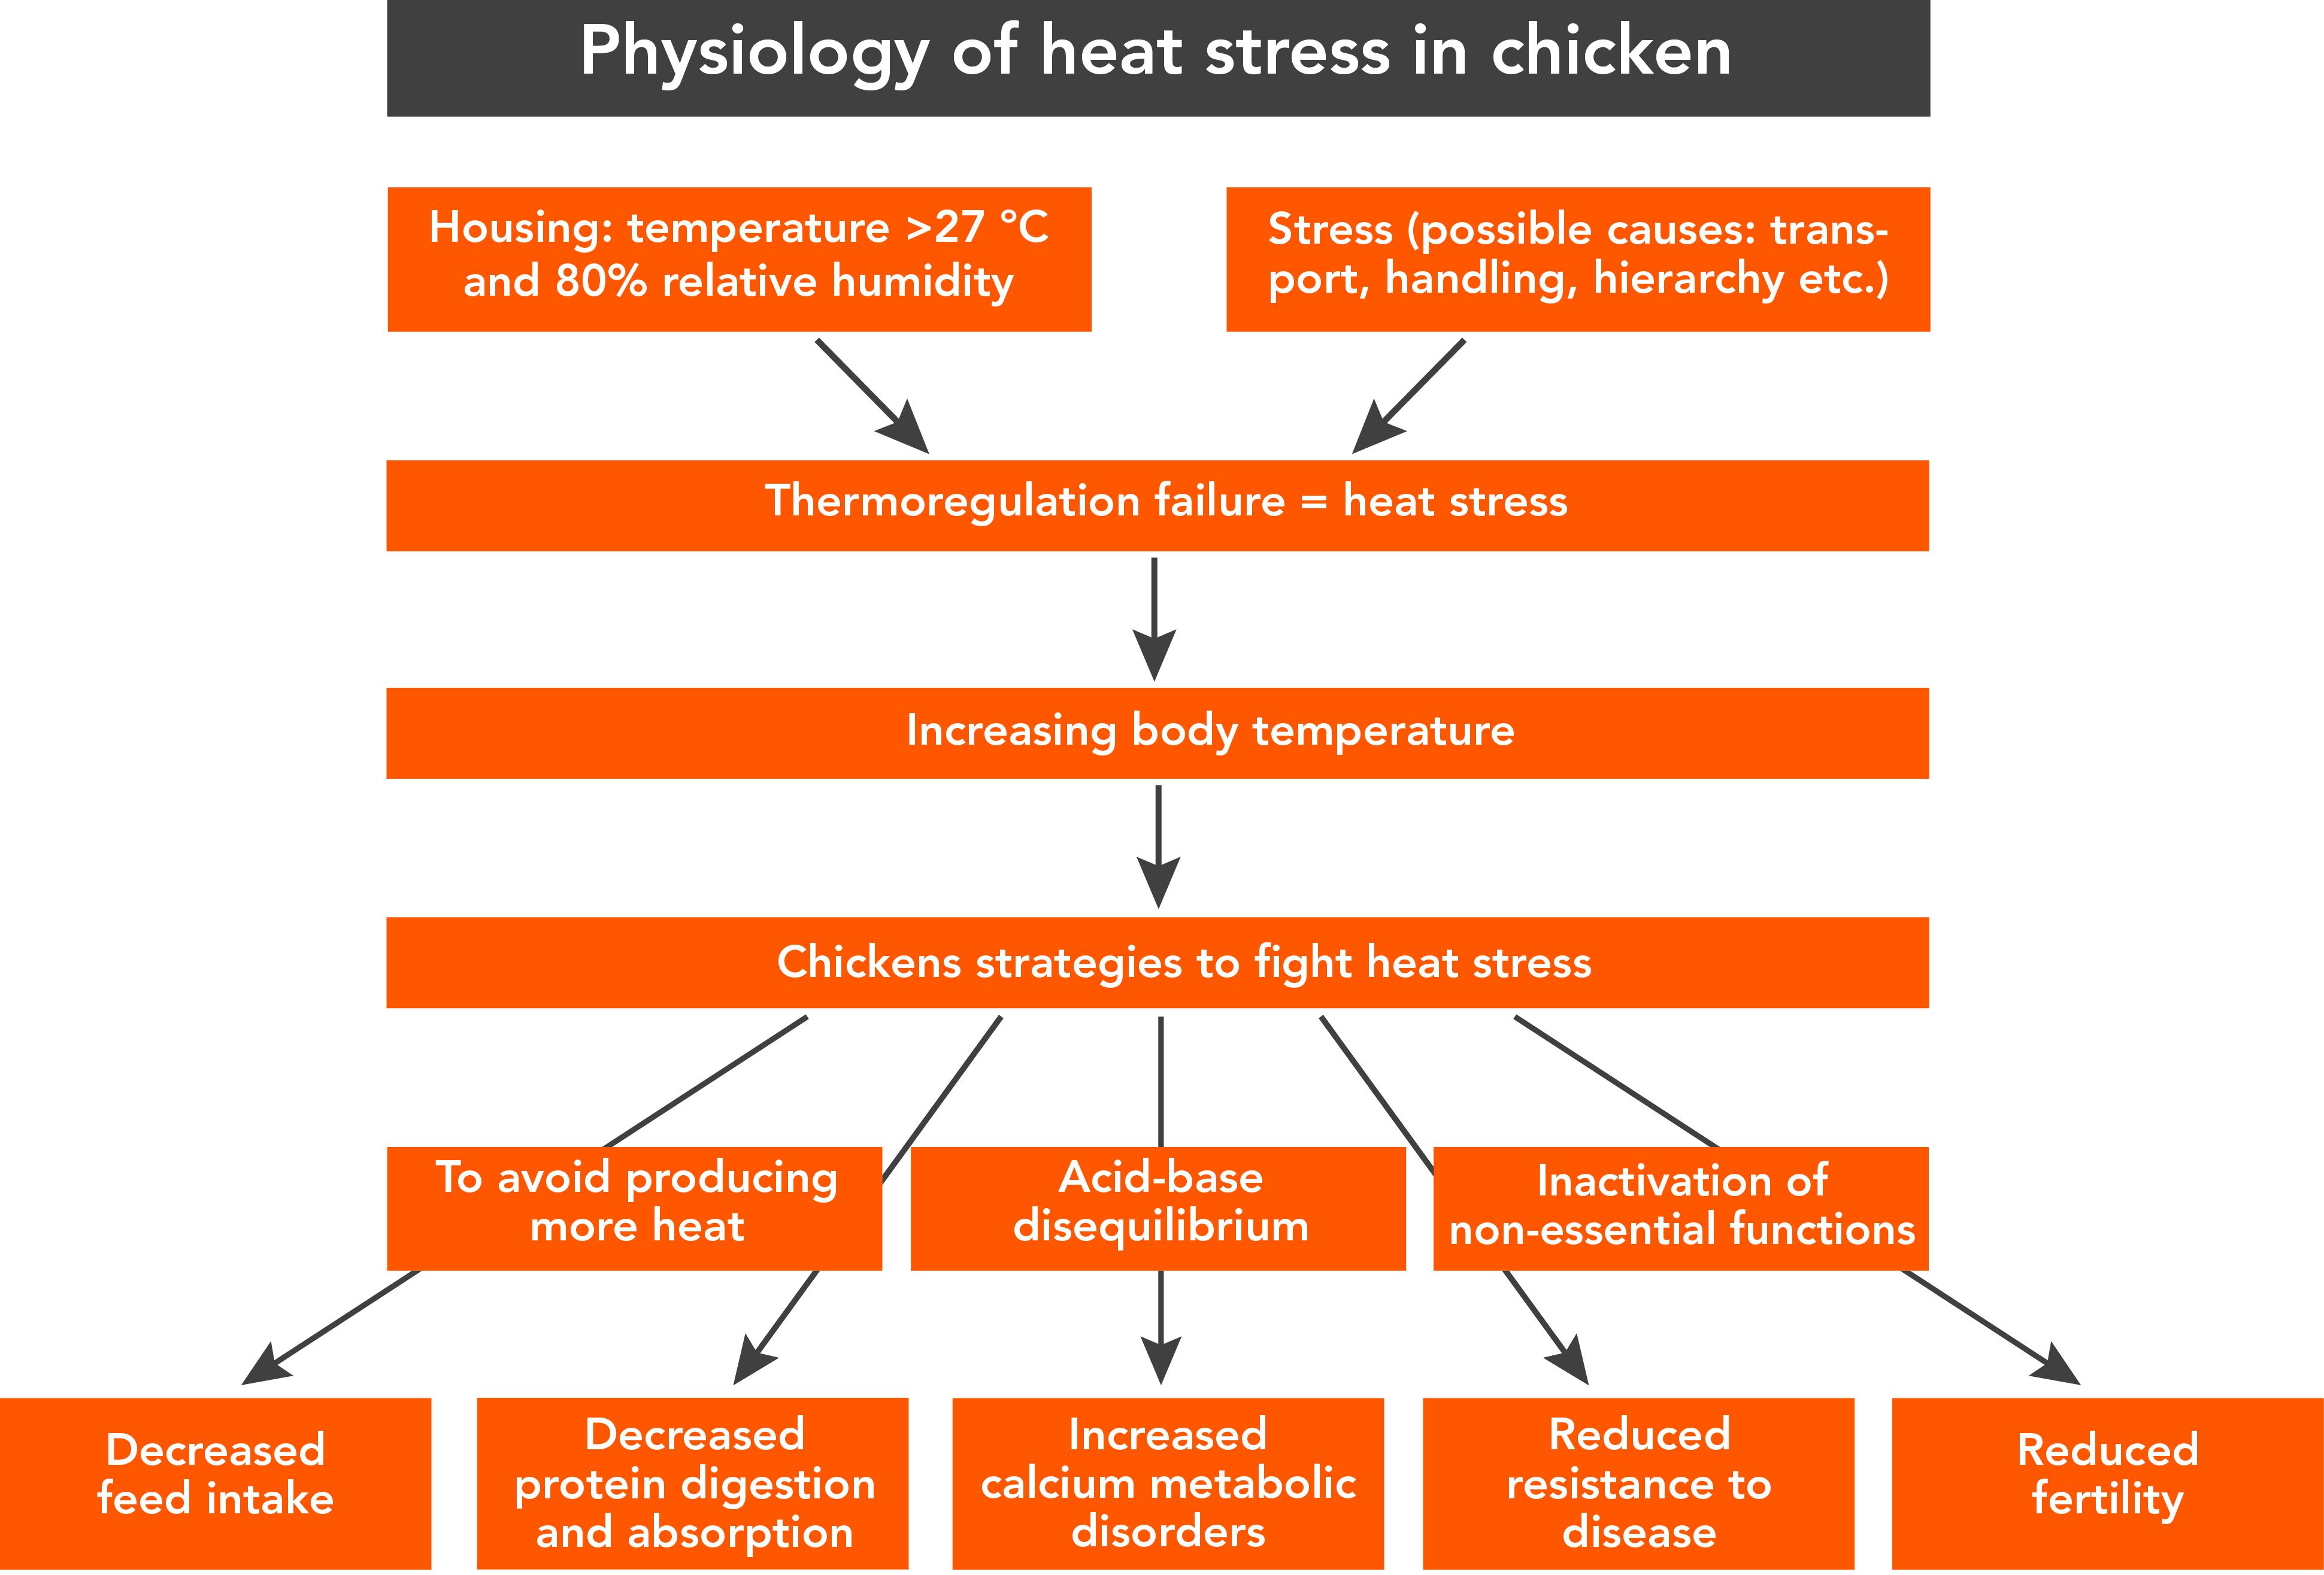 Physiology%20of%20heat%20stress%20in%20chicken_1518790401.jpg